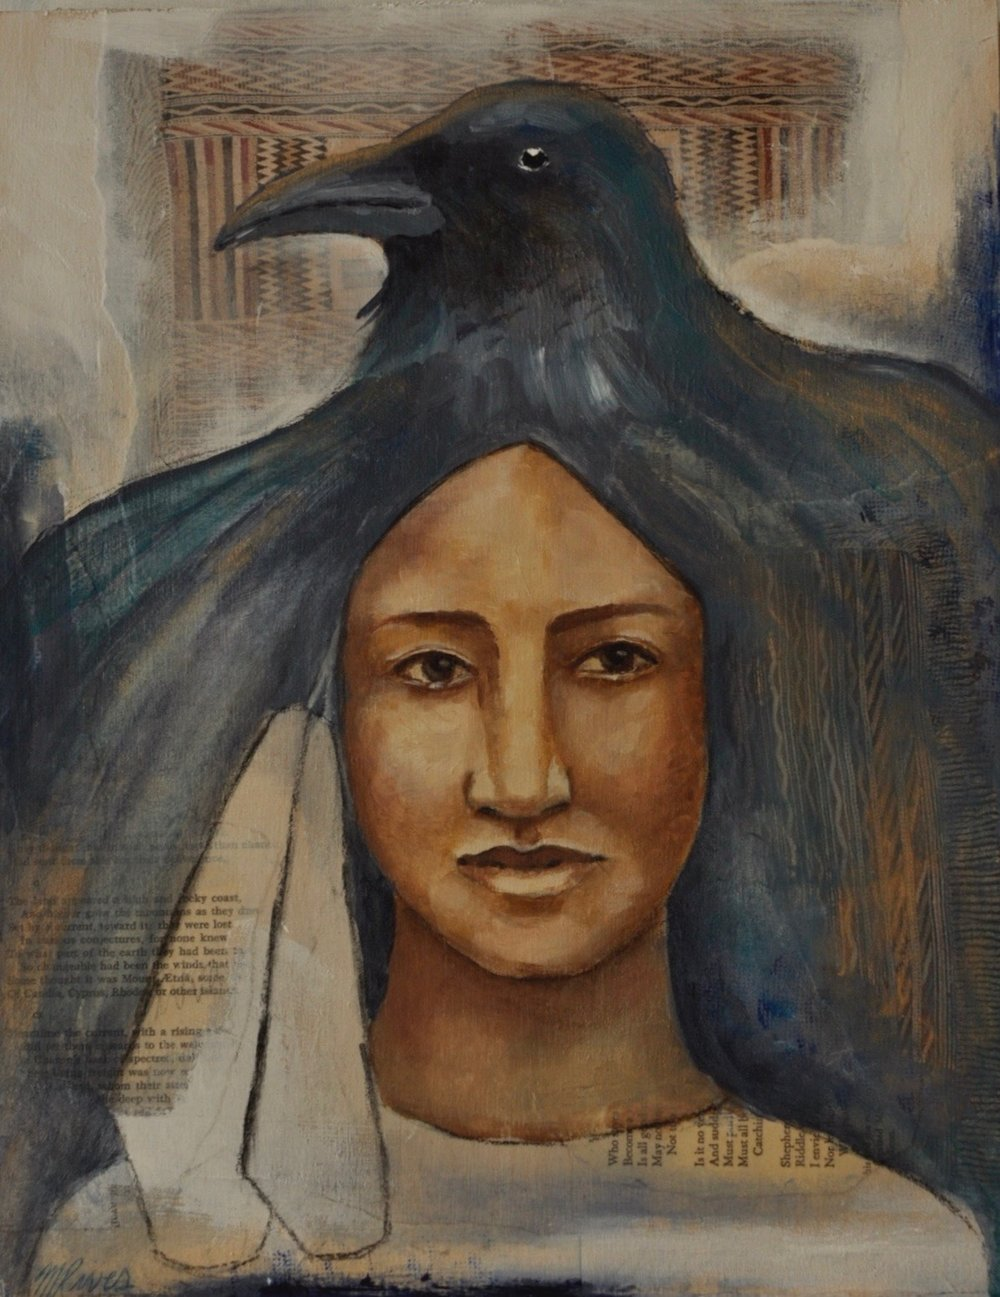 Raven Voice